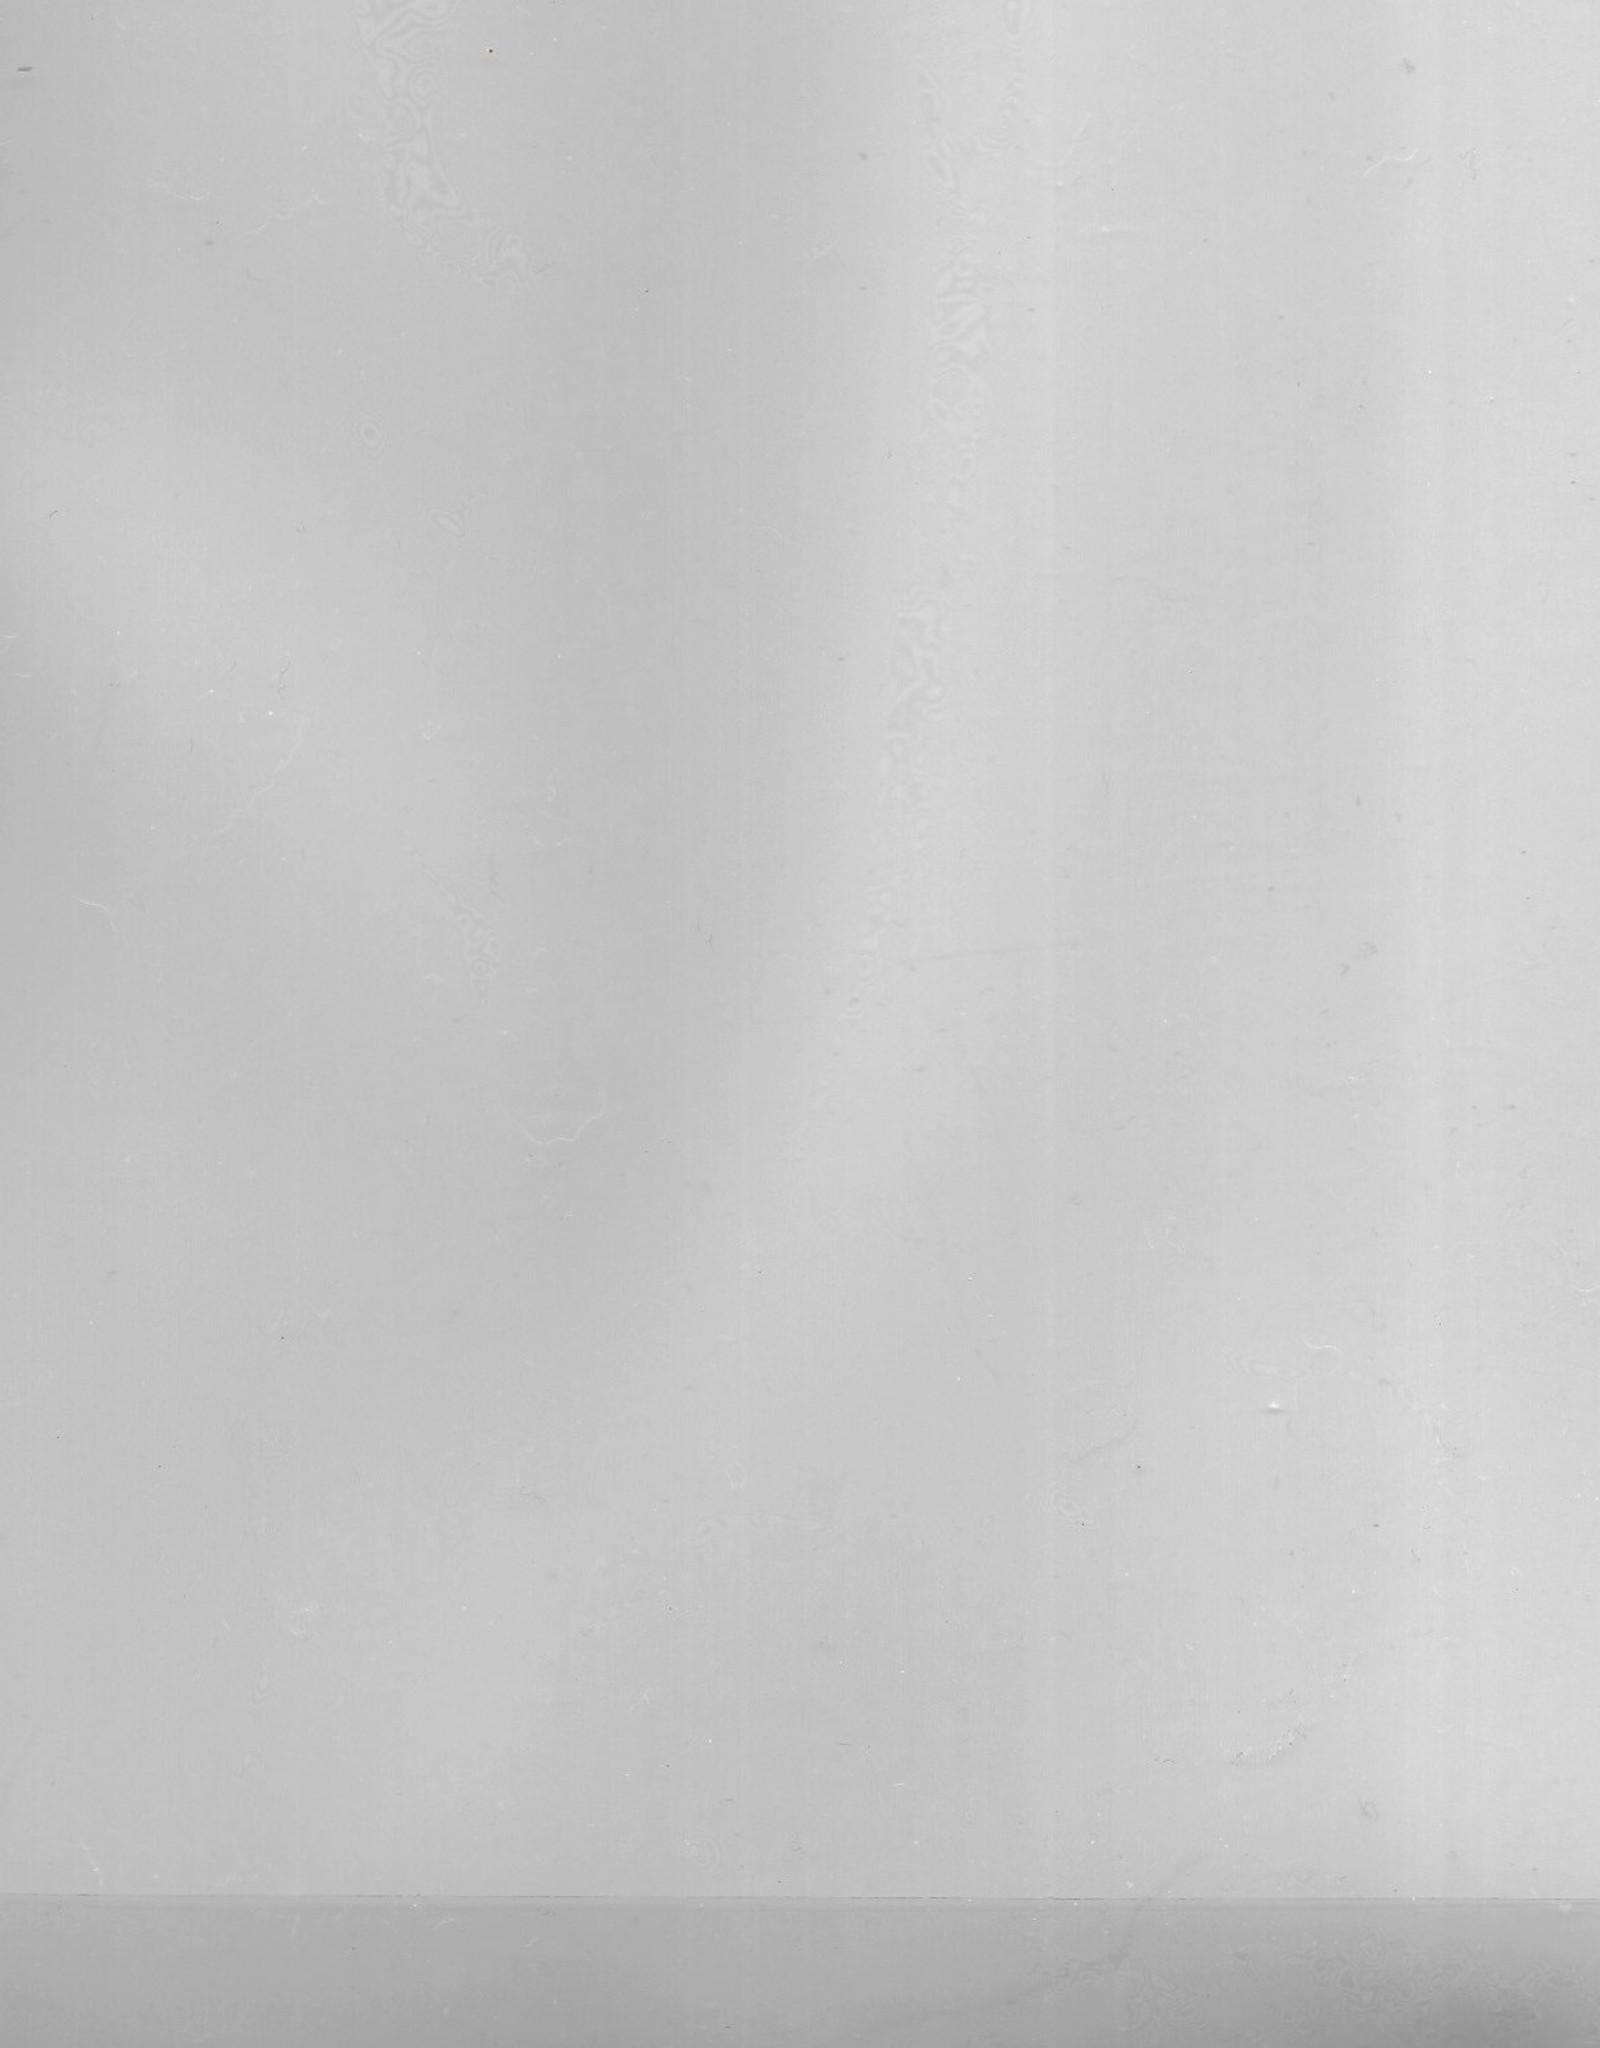 "Lineco Self Sealing L-Velopes Sleeves, 9"" x 12"", 3mil, 5 Sleeves"